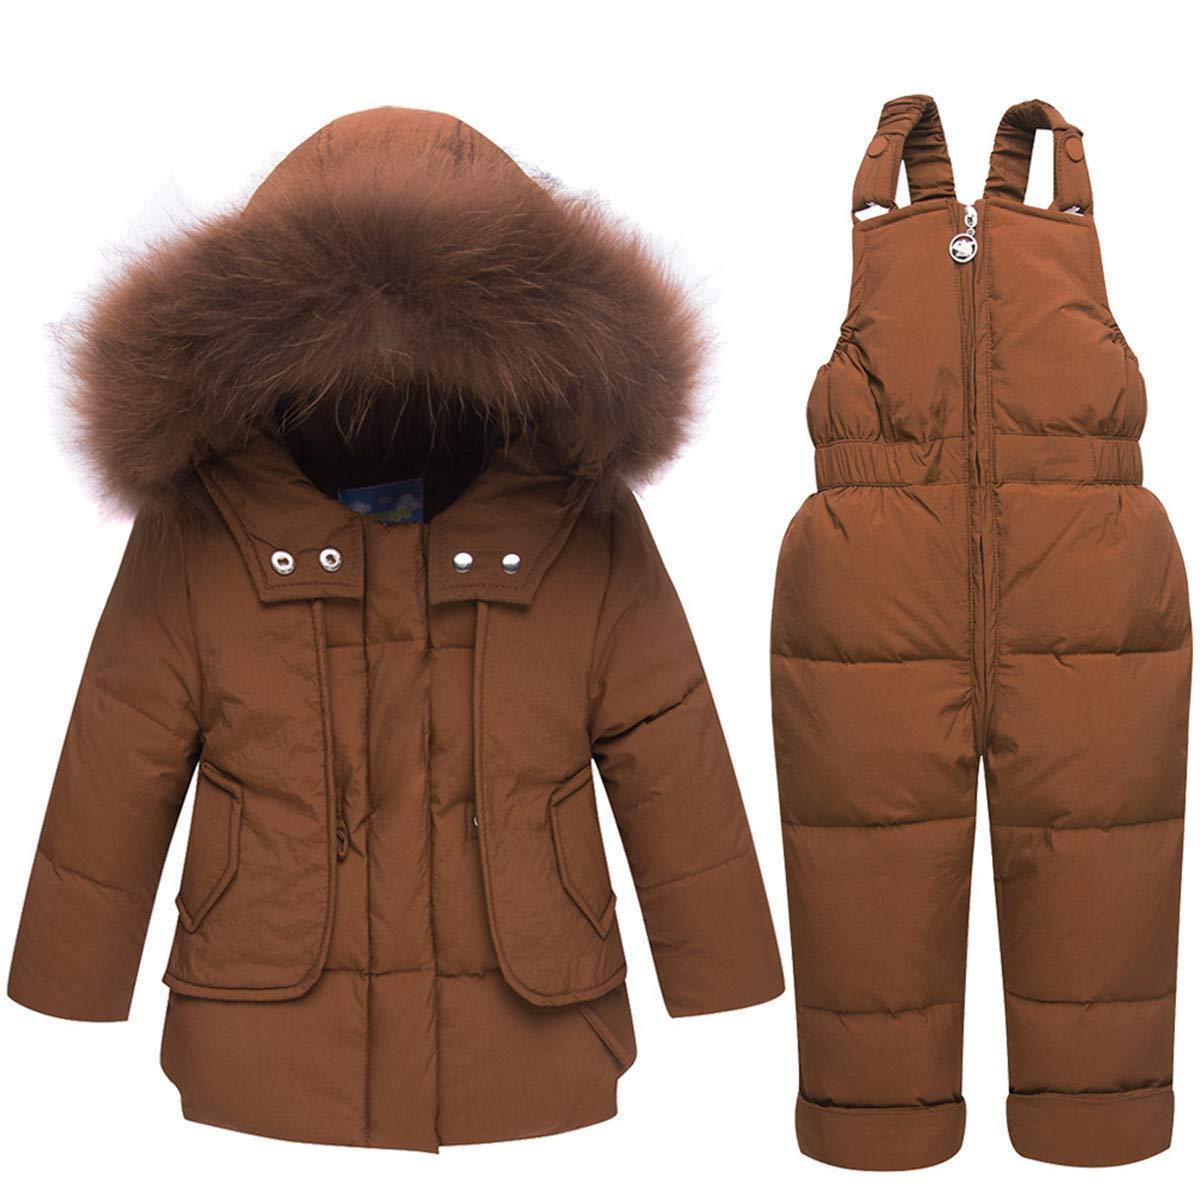 FAIRYRAIN Little Kids Baby Girls Boys Two Piece Winter Warm Zipper Fur Trim Hooded Snowsuit Puffer Down Jacket Snow Ski Bib Pants Outfits Outwear pdfwj-tw1